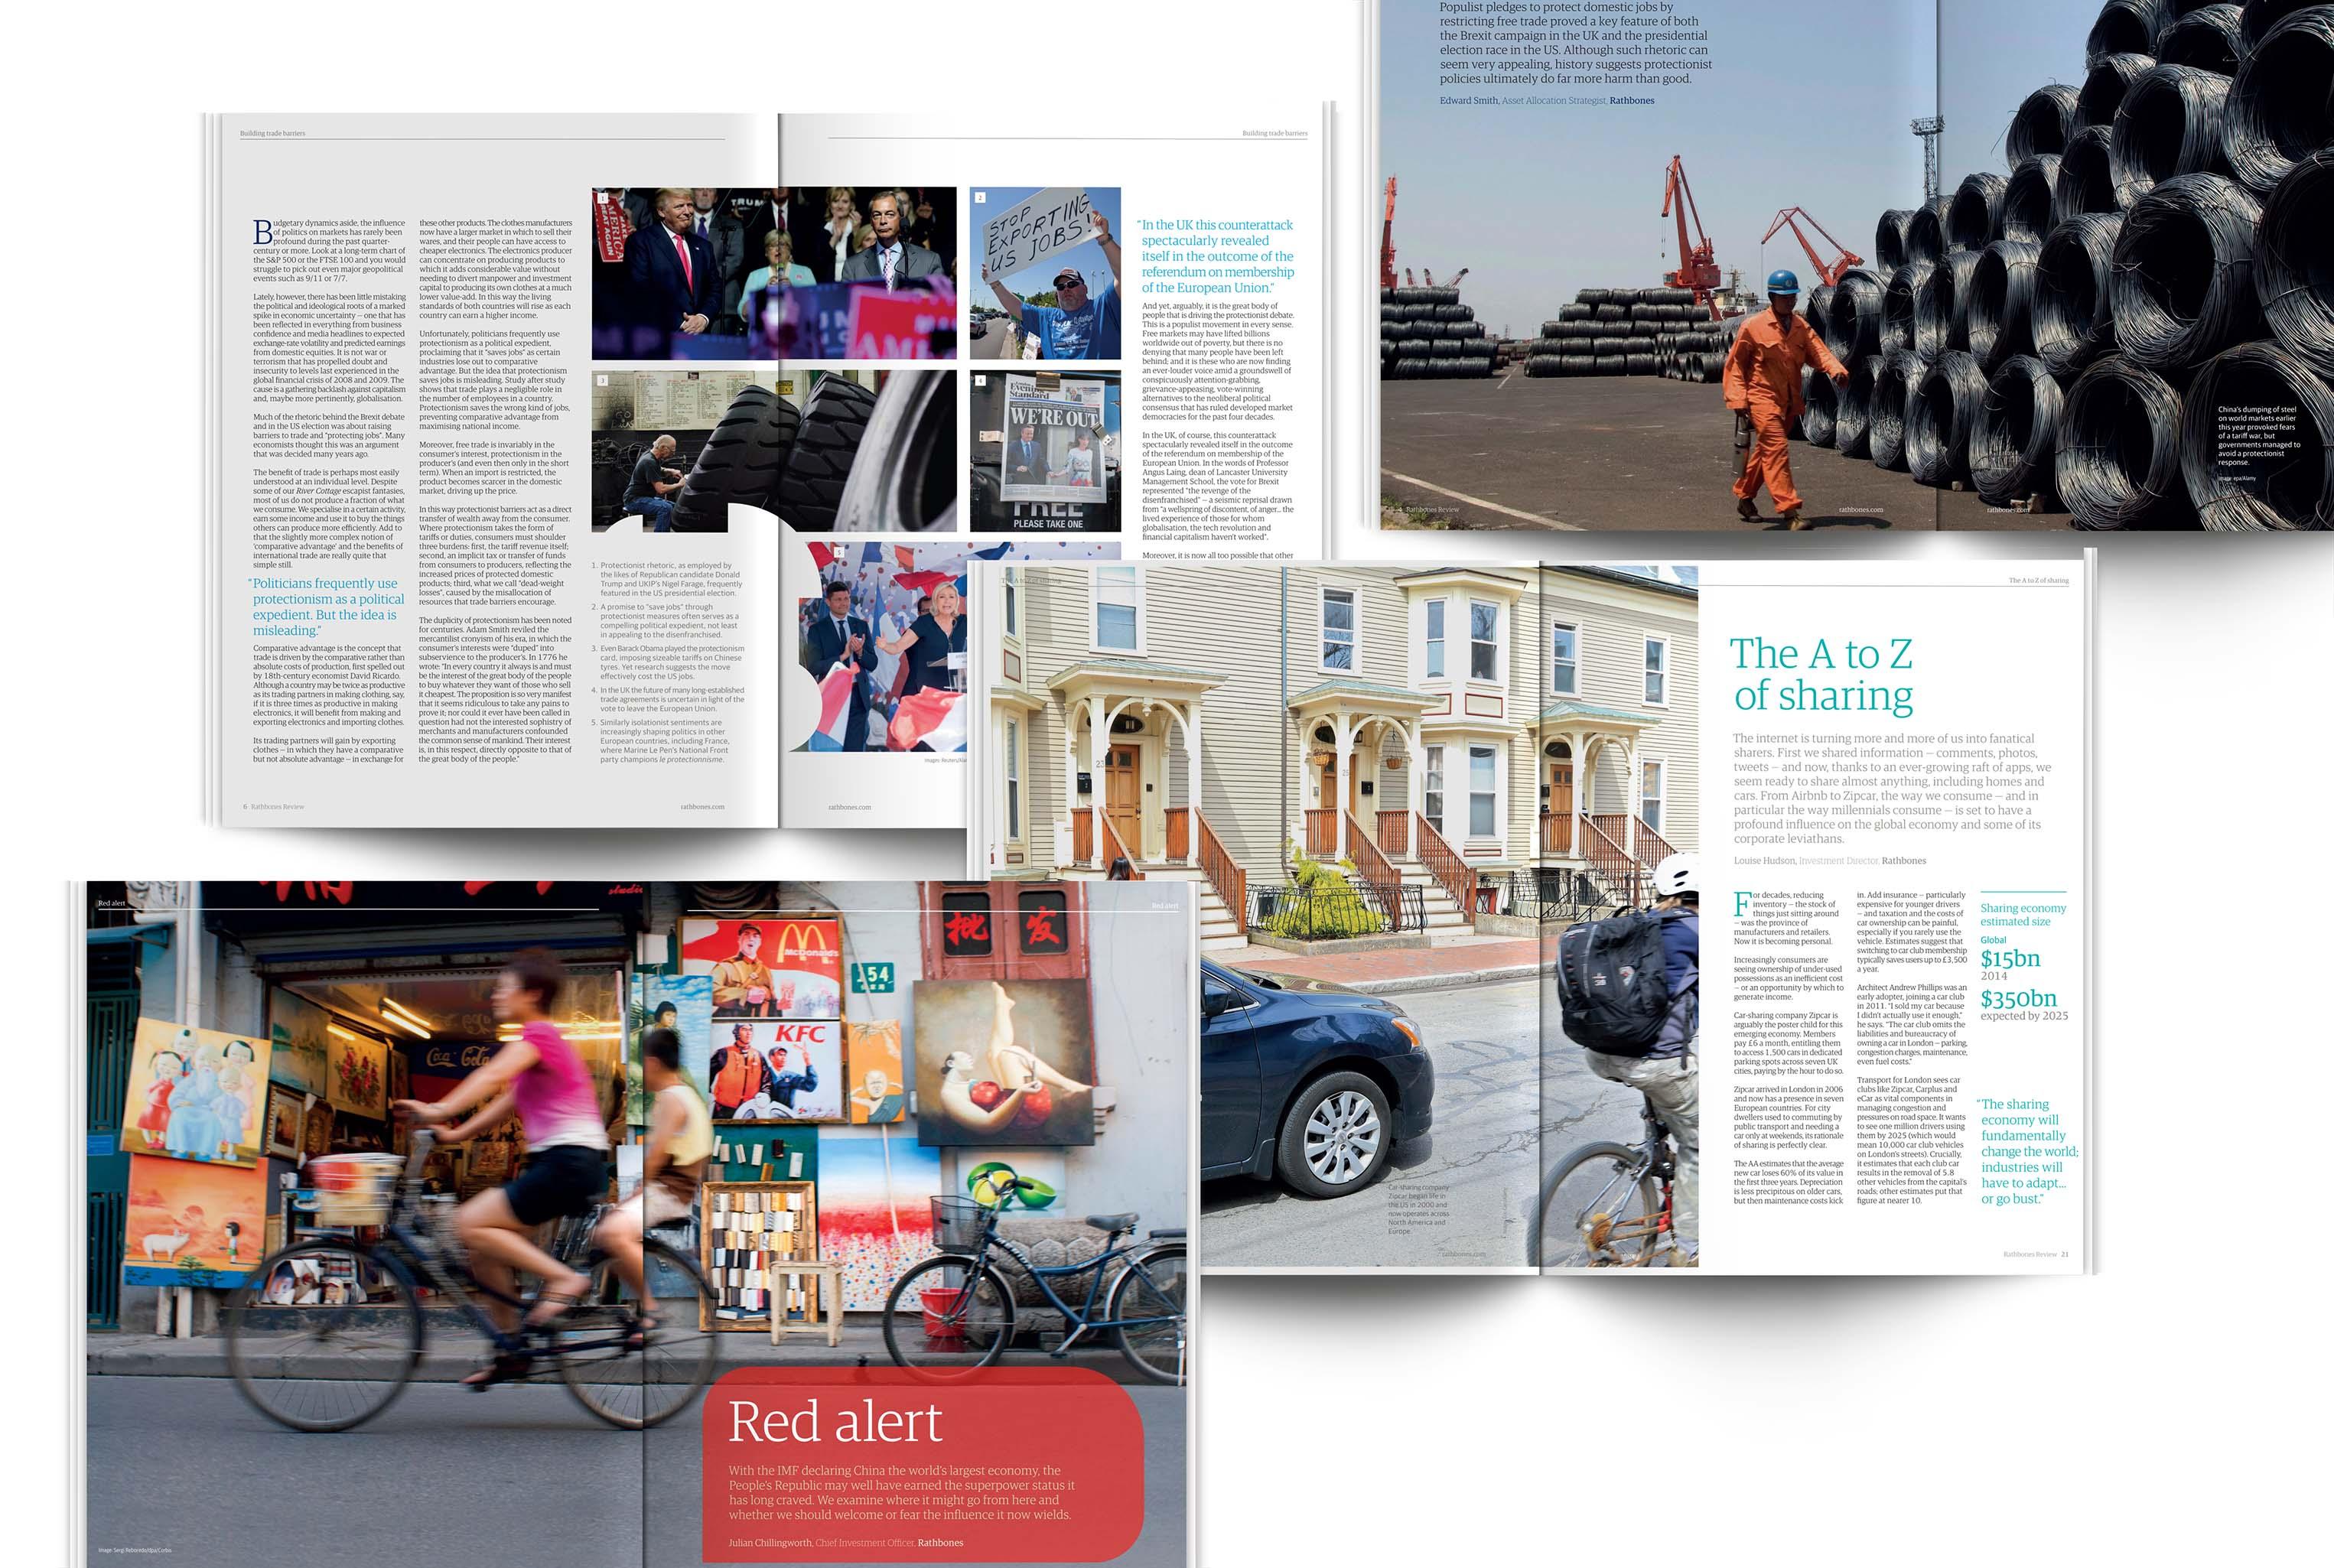 Rathbones Review magazine spreads